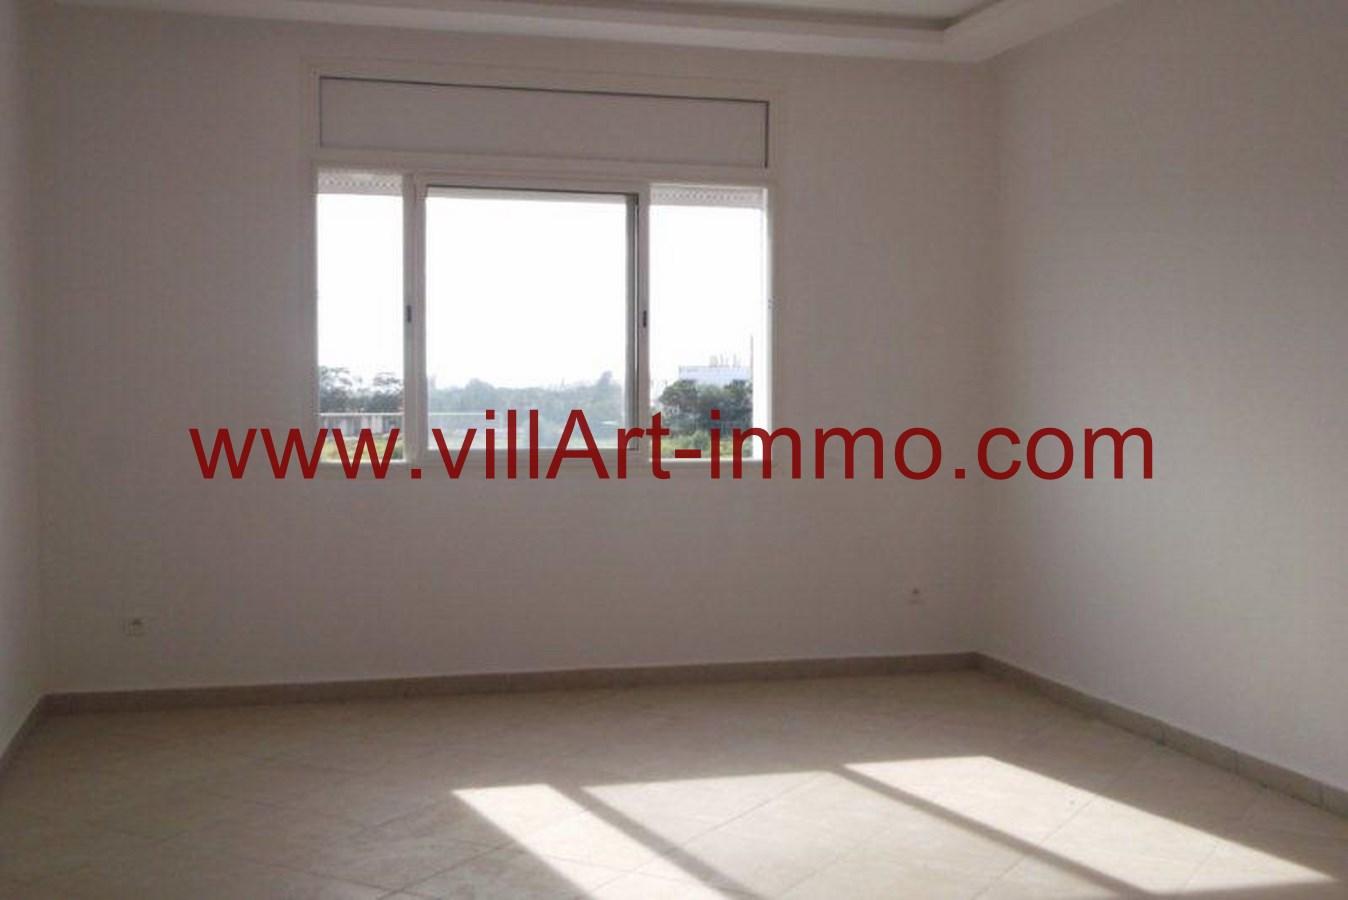 1-Location-Appartement-Non meublé-Tanger-Salon-L736-Villart immo